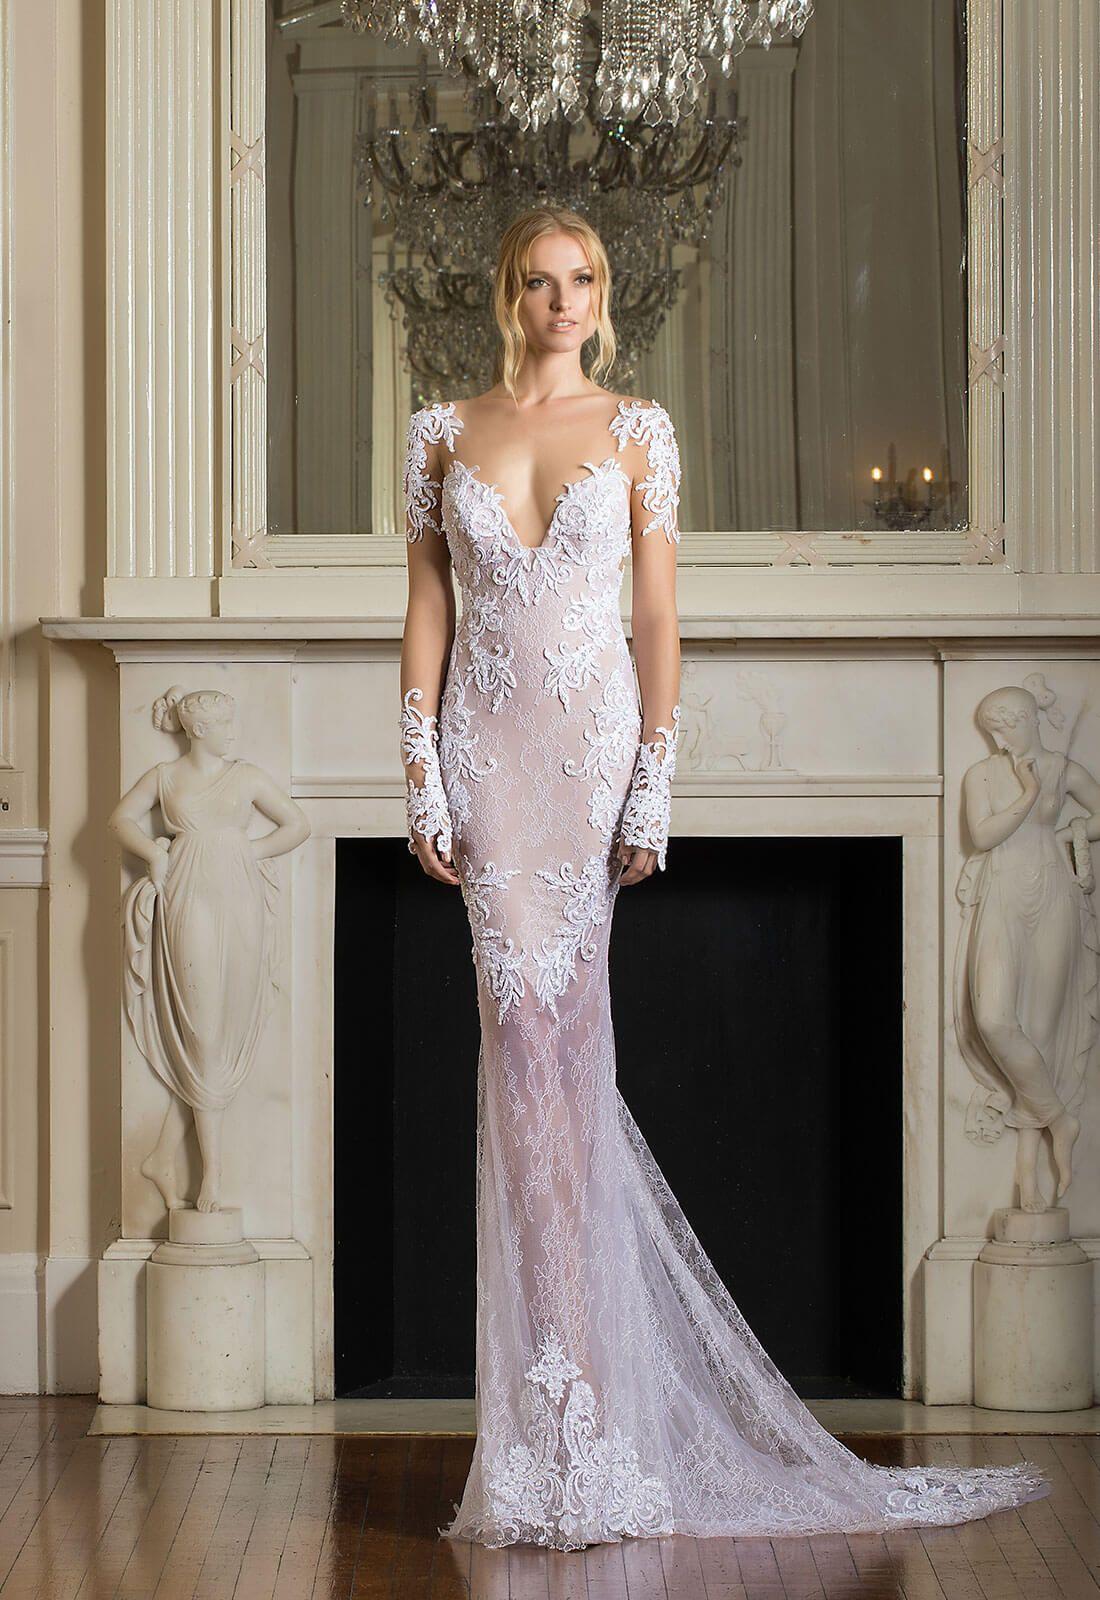 Pnina tornai sexy sheath wedding dress 11500 kleinfeld for Kleinfeld wedding dress designers